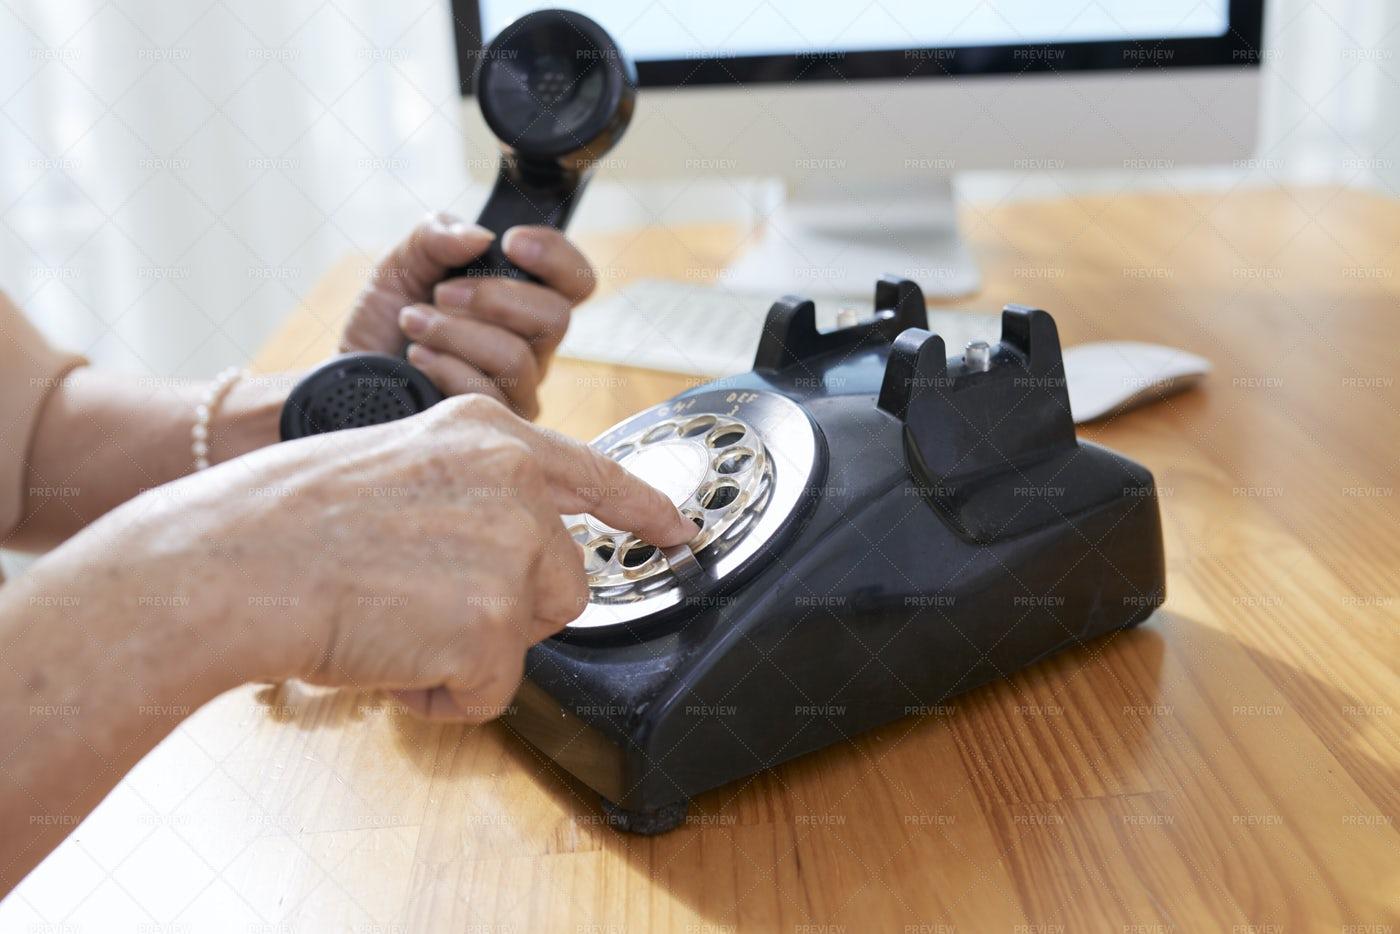 Senior Woman Making Phone Call: Stock Photos